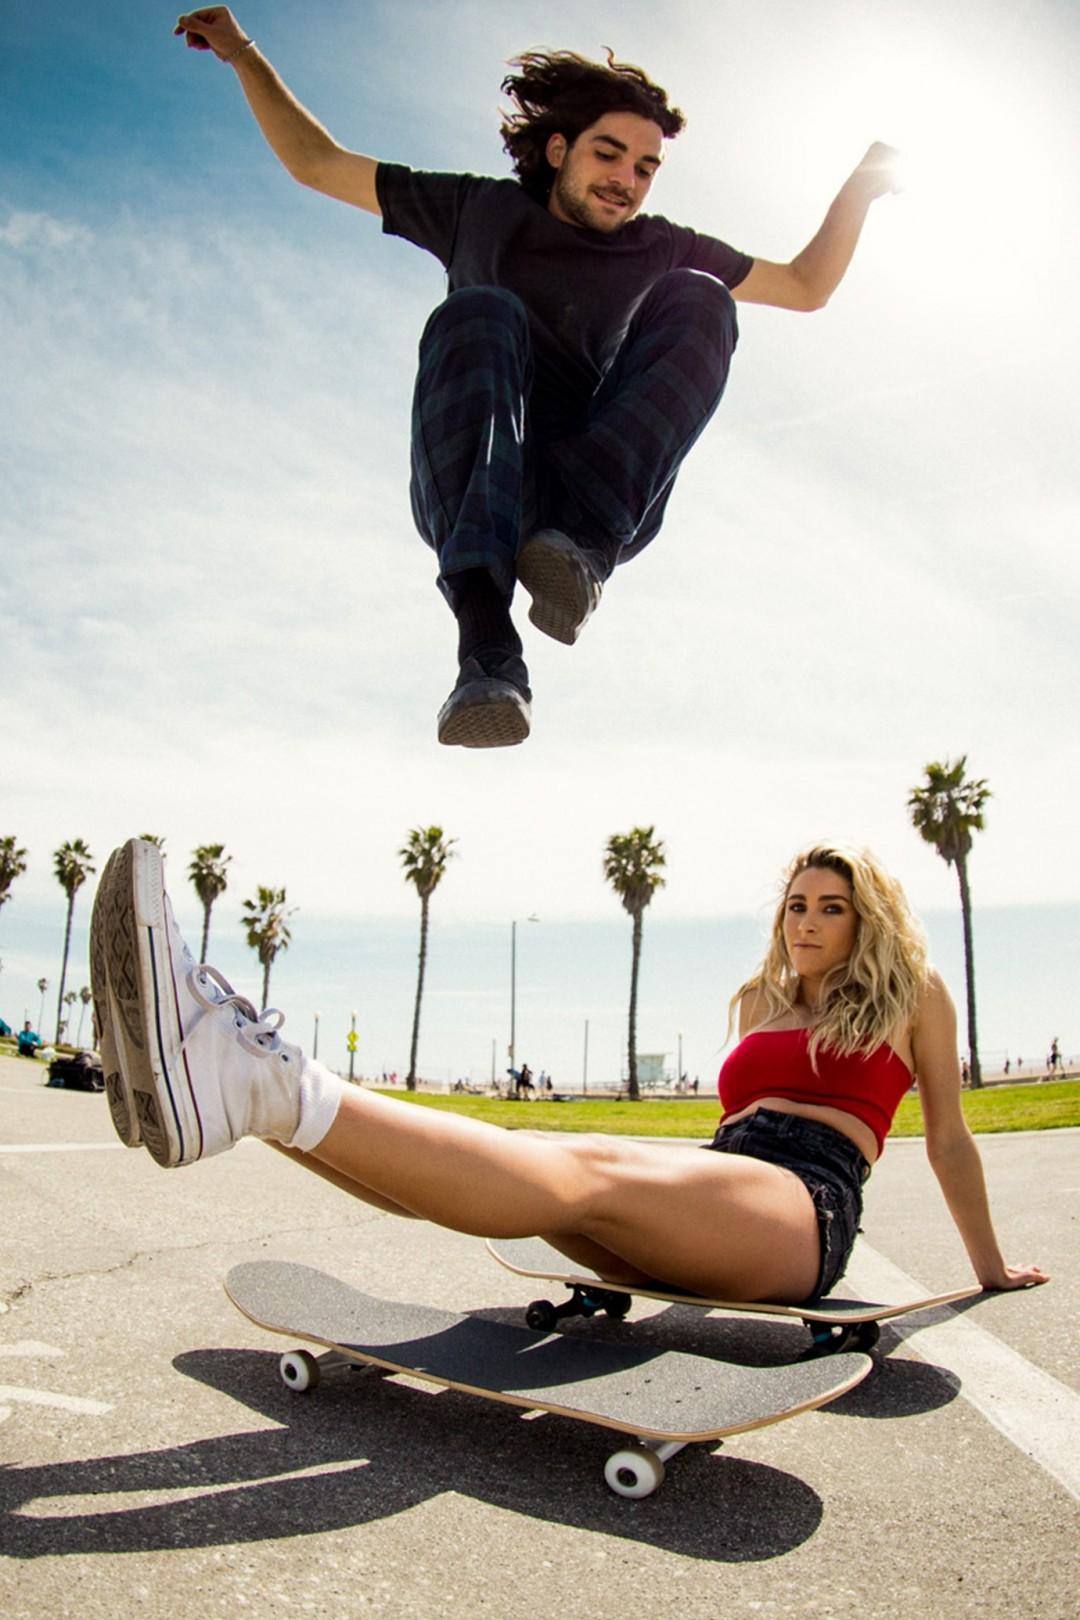 Skateboard-New10_